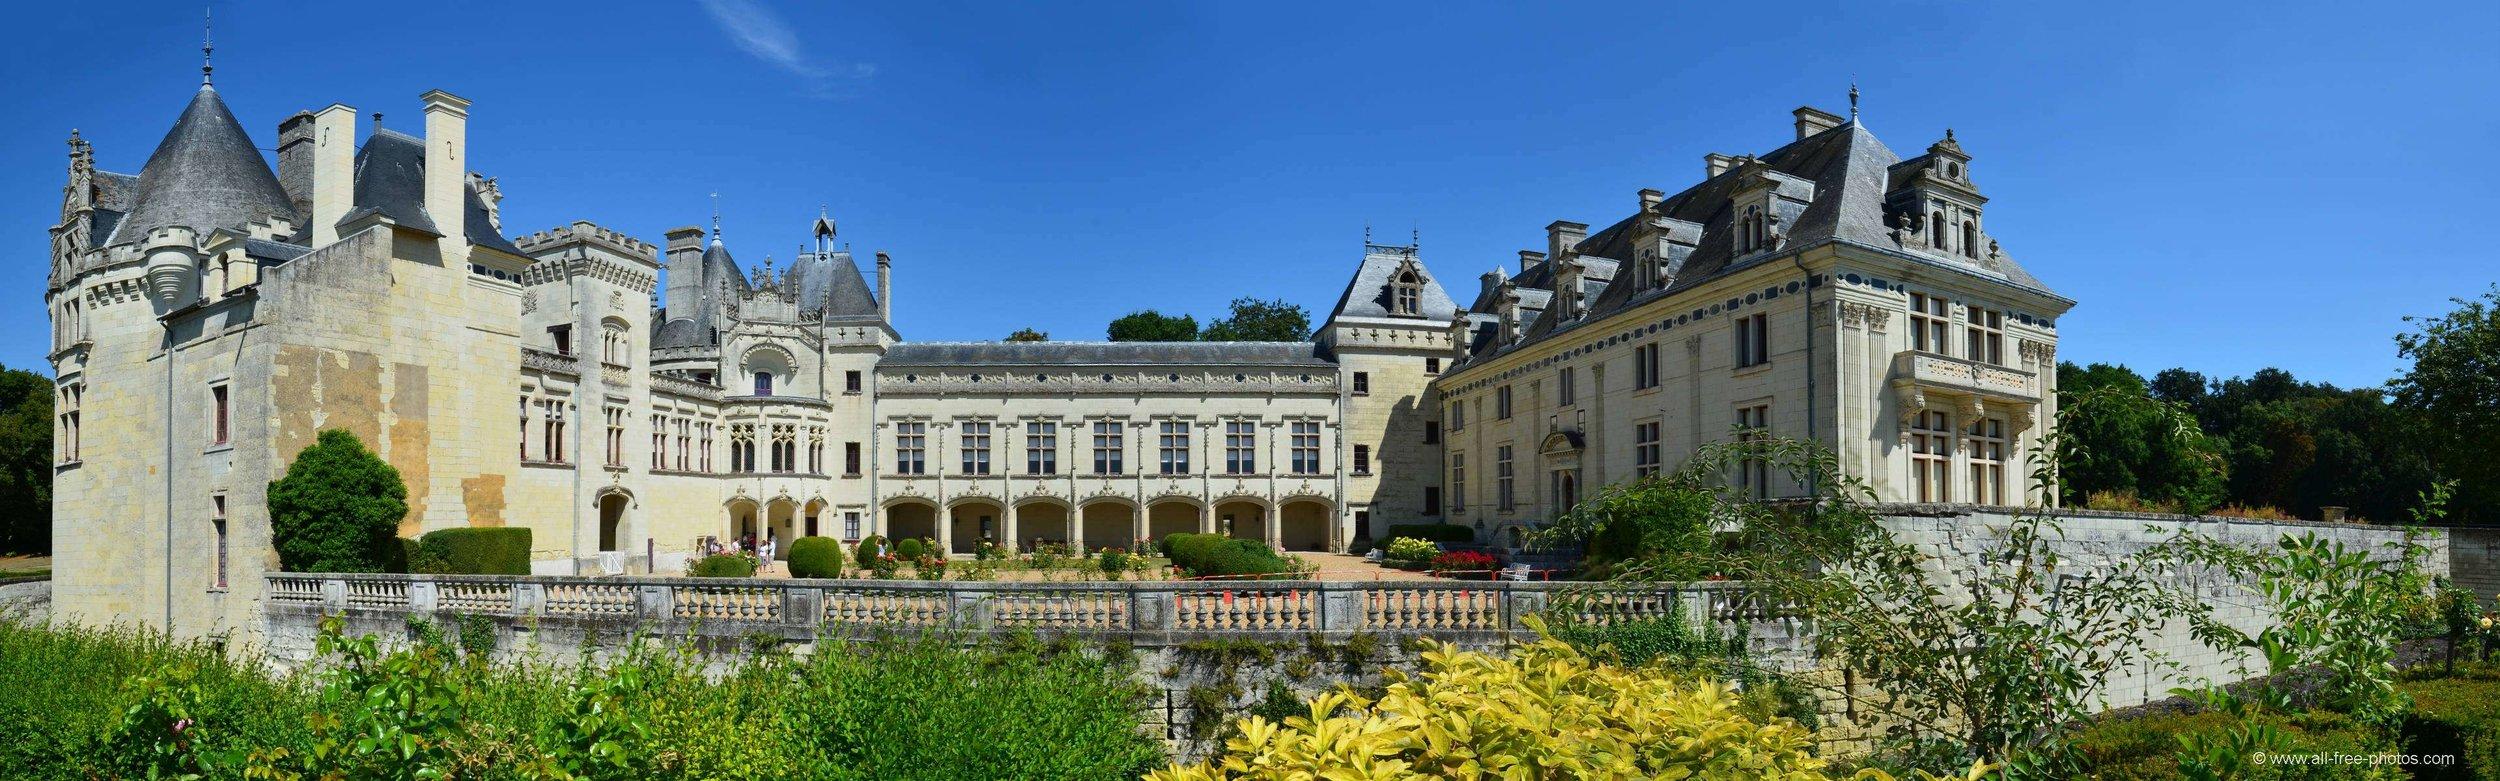 The majesty of Chateau de Breze